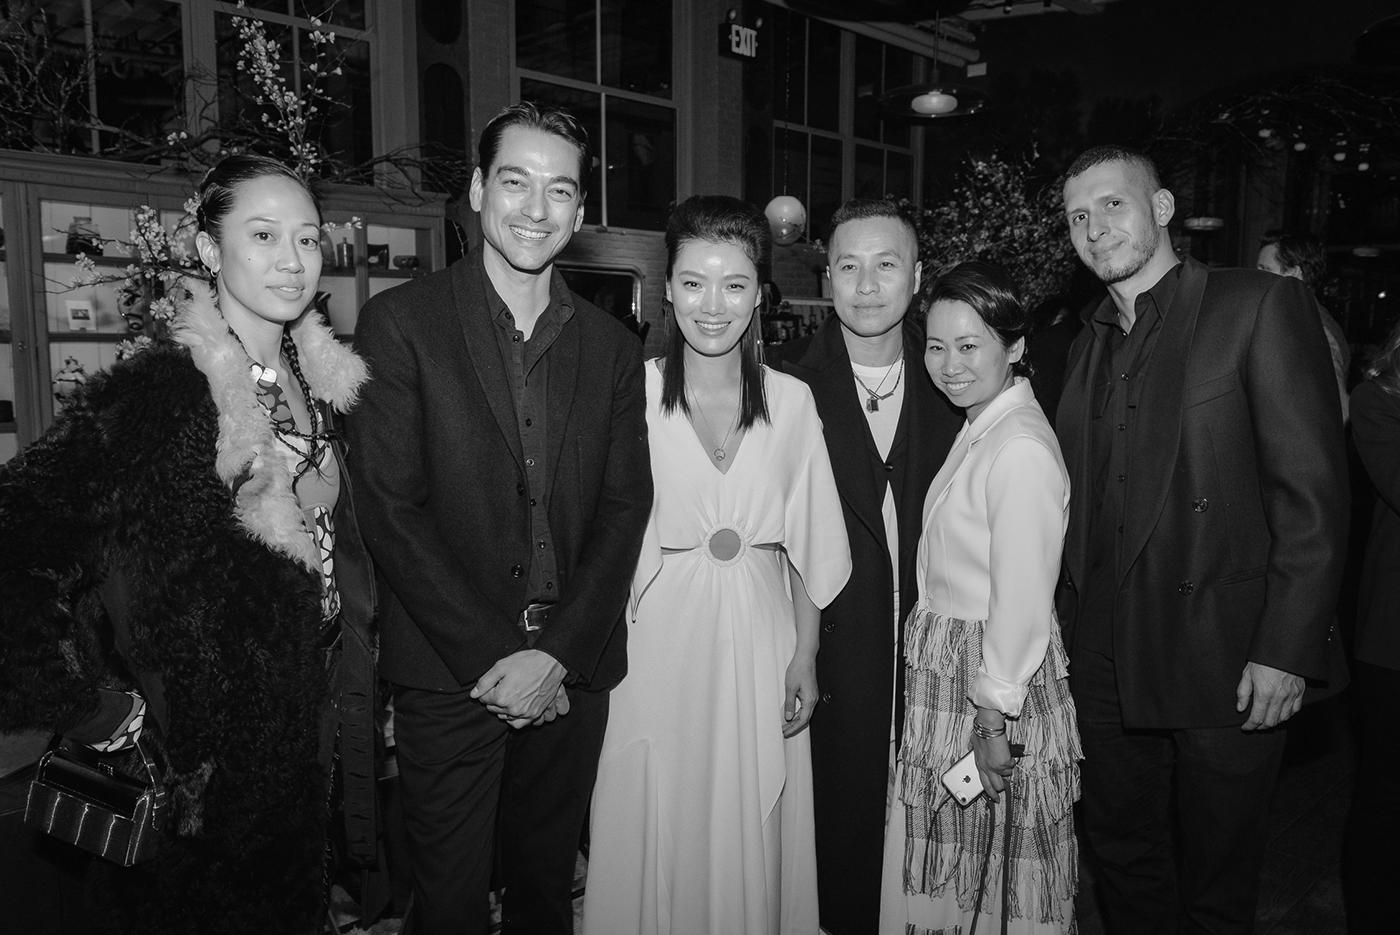 Kim Bui Kollar, Tenzin Wild, Lisa Qi, Phillip Lim, Wen Zhou, and Victor Hernandez